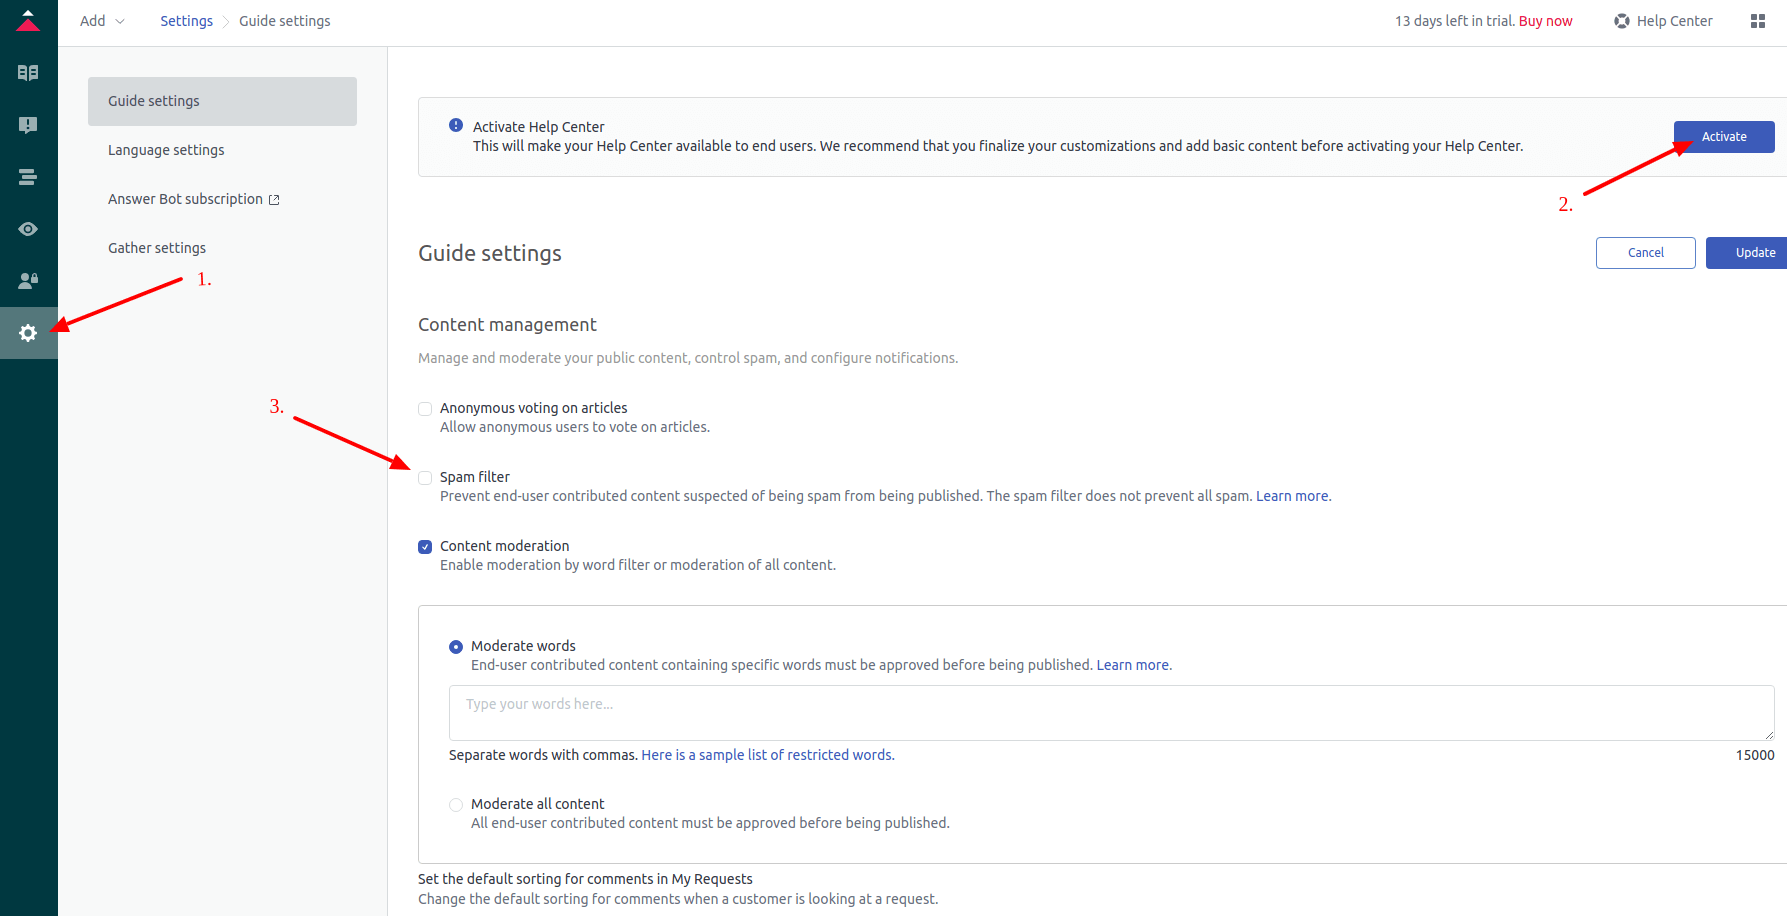 Activating Zendesk Guide